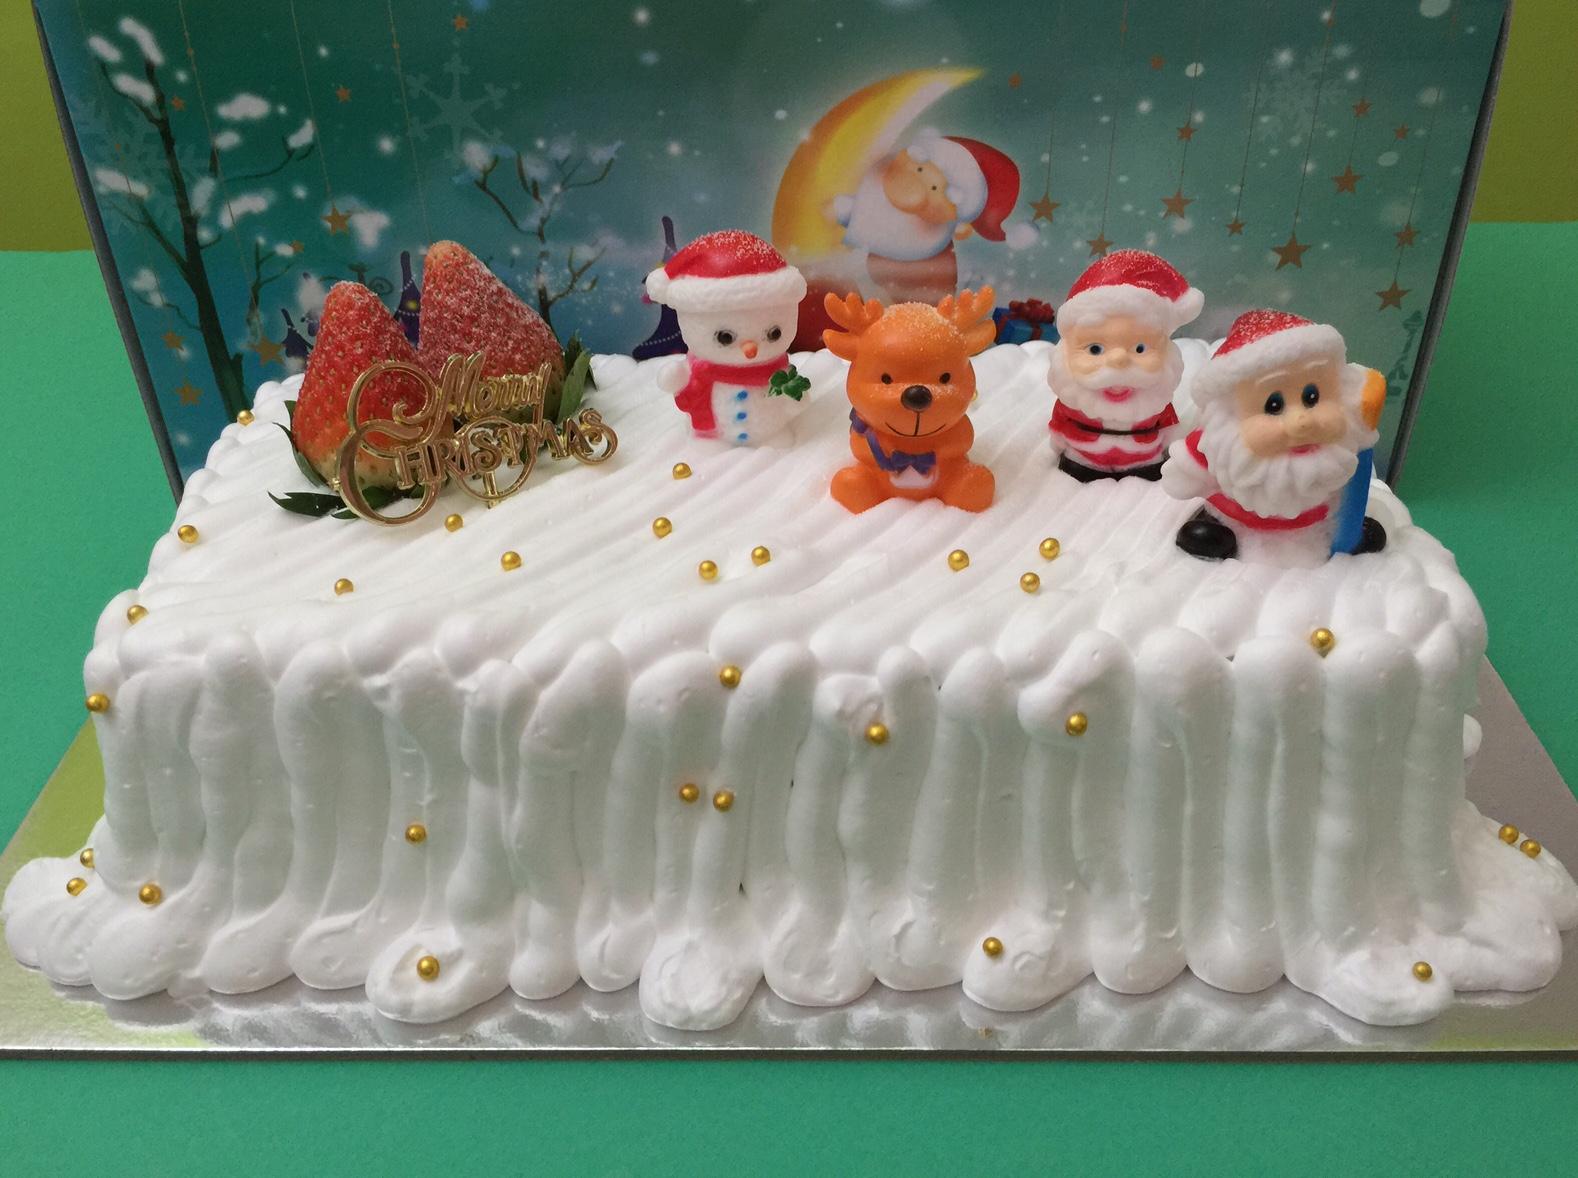 Snowy Log Cake